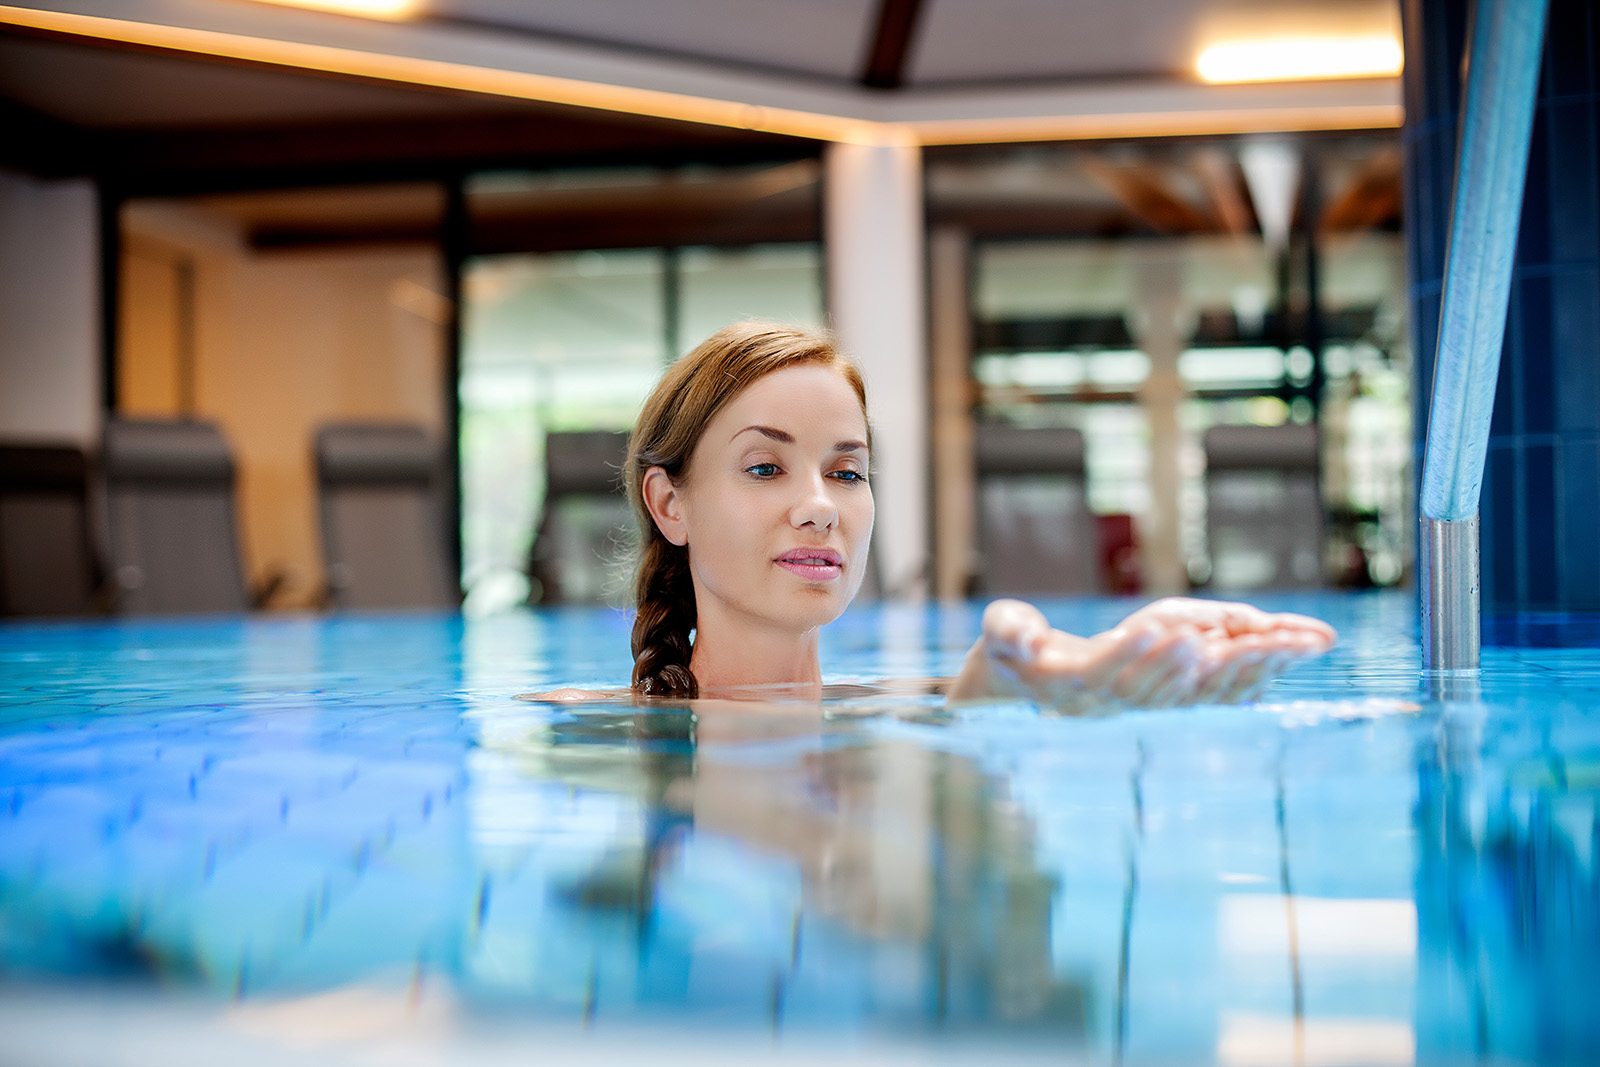 Heiltherme Bad Waltersdorf Frau genießt Thermalwasser im Pool